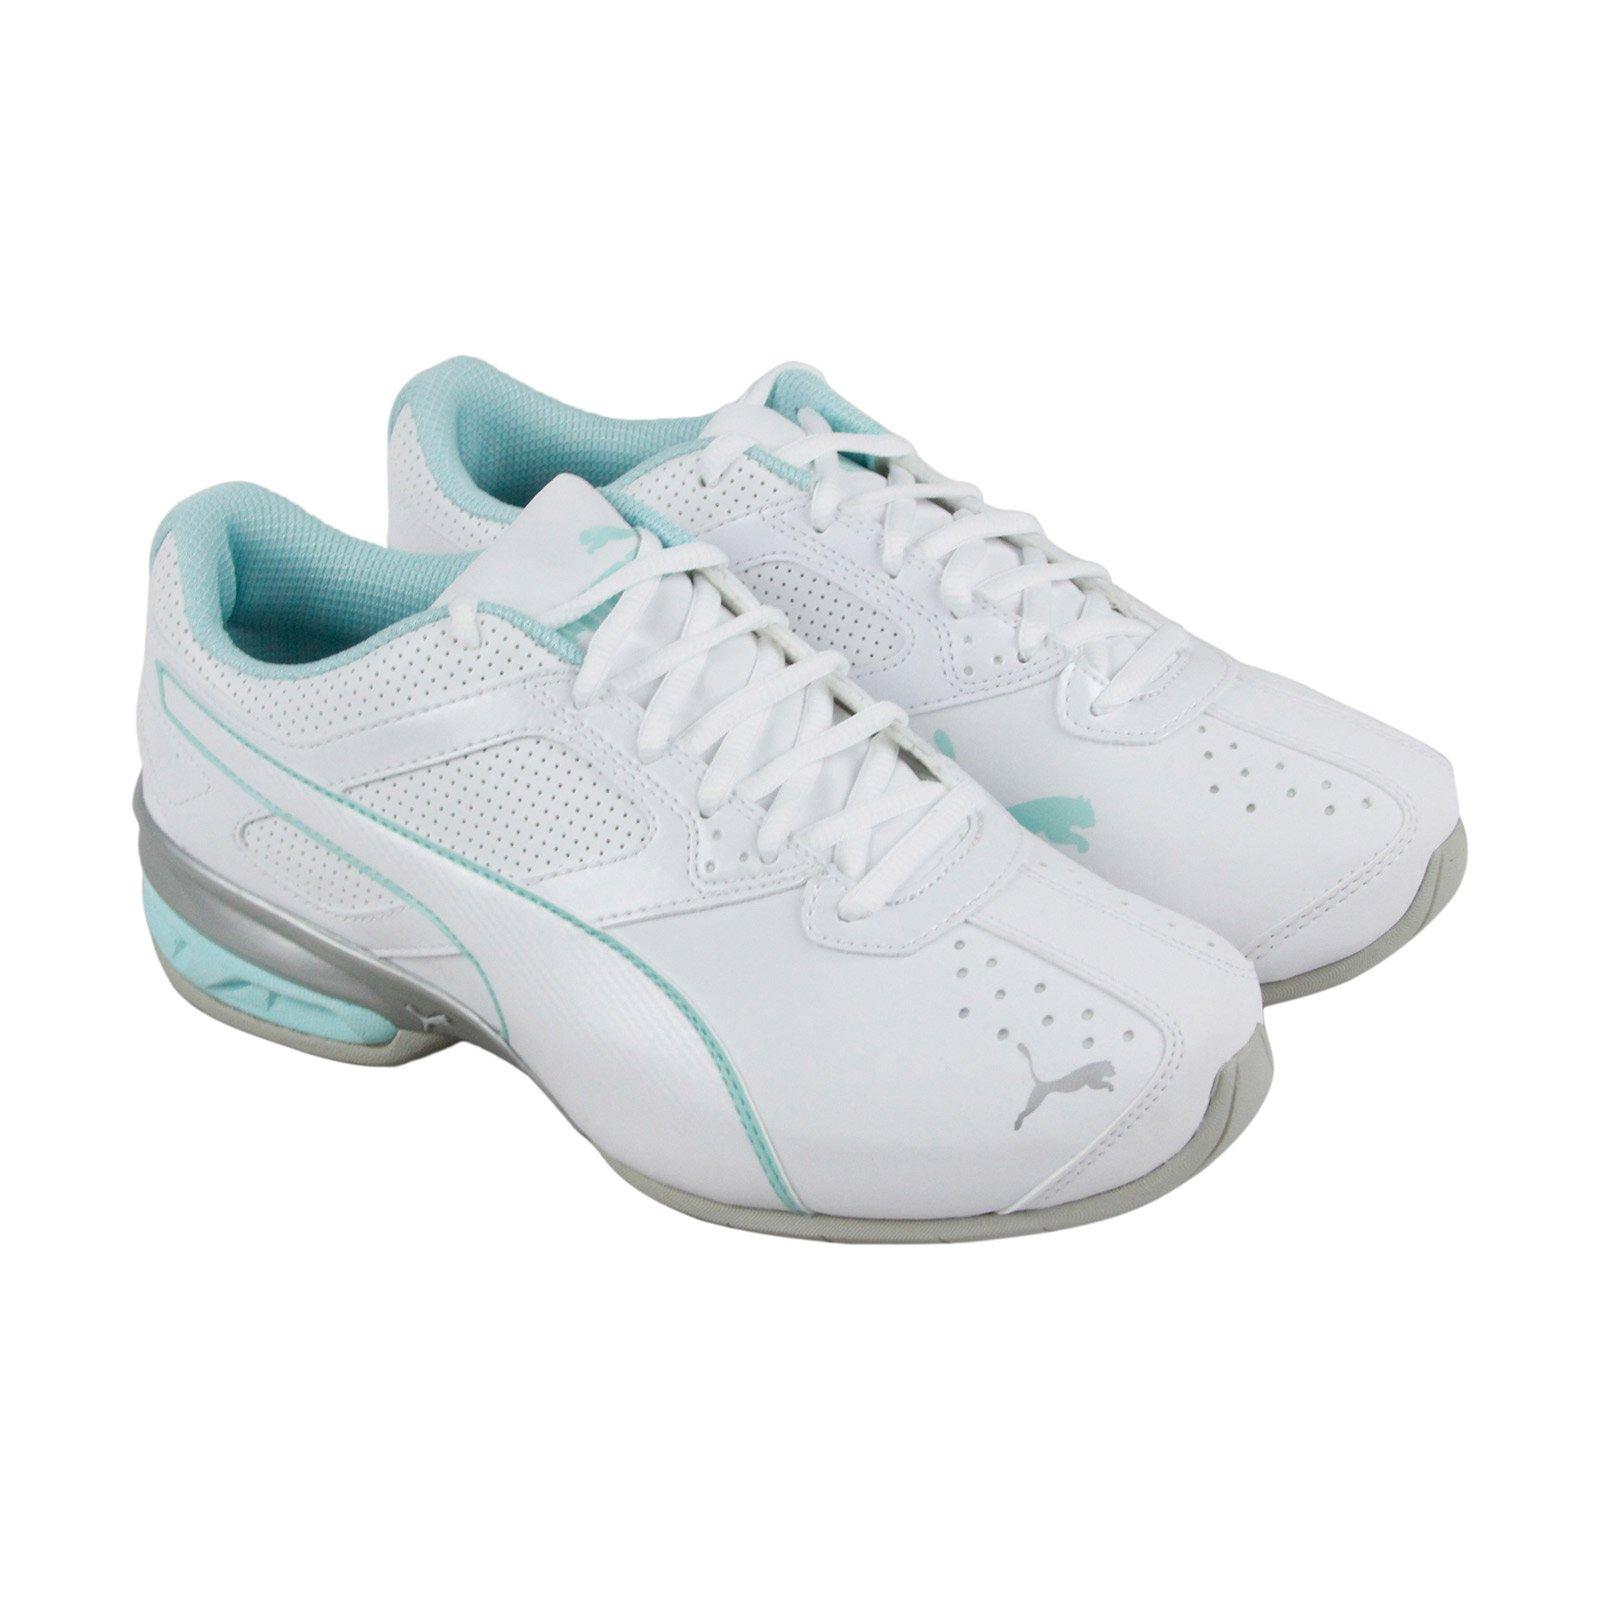 PUMA Women's Tazon 6 Wide Wn Sneaker, White-Island Paradise Silver, 8 W US